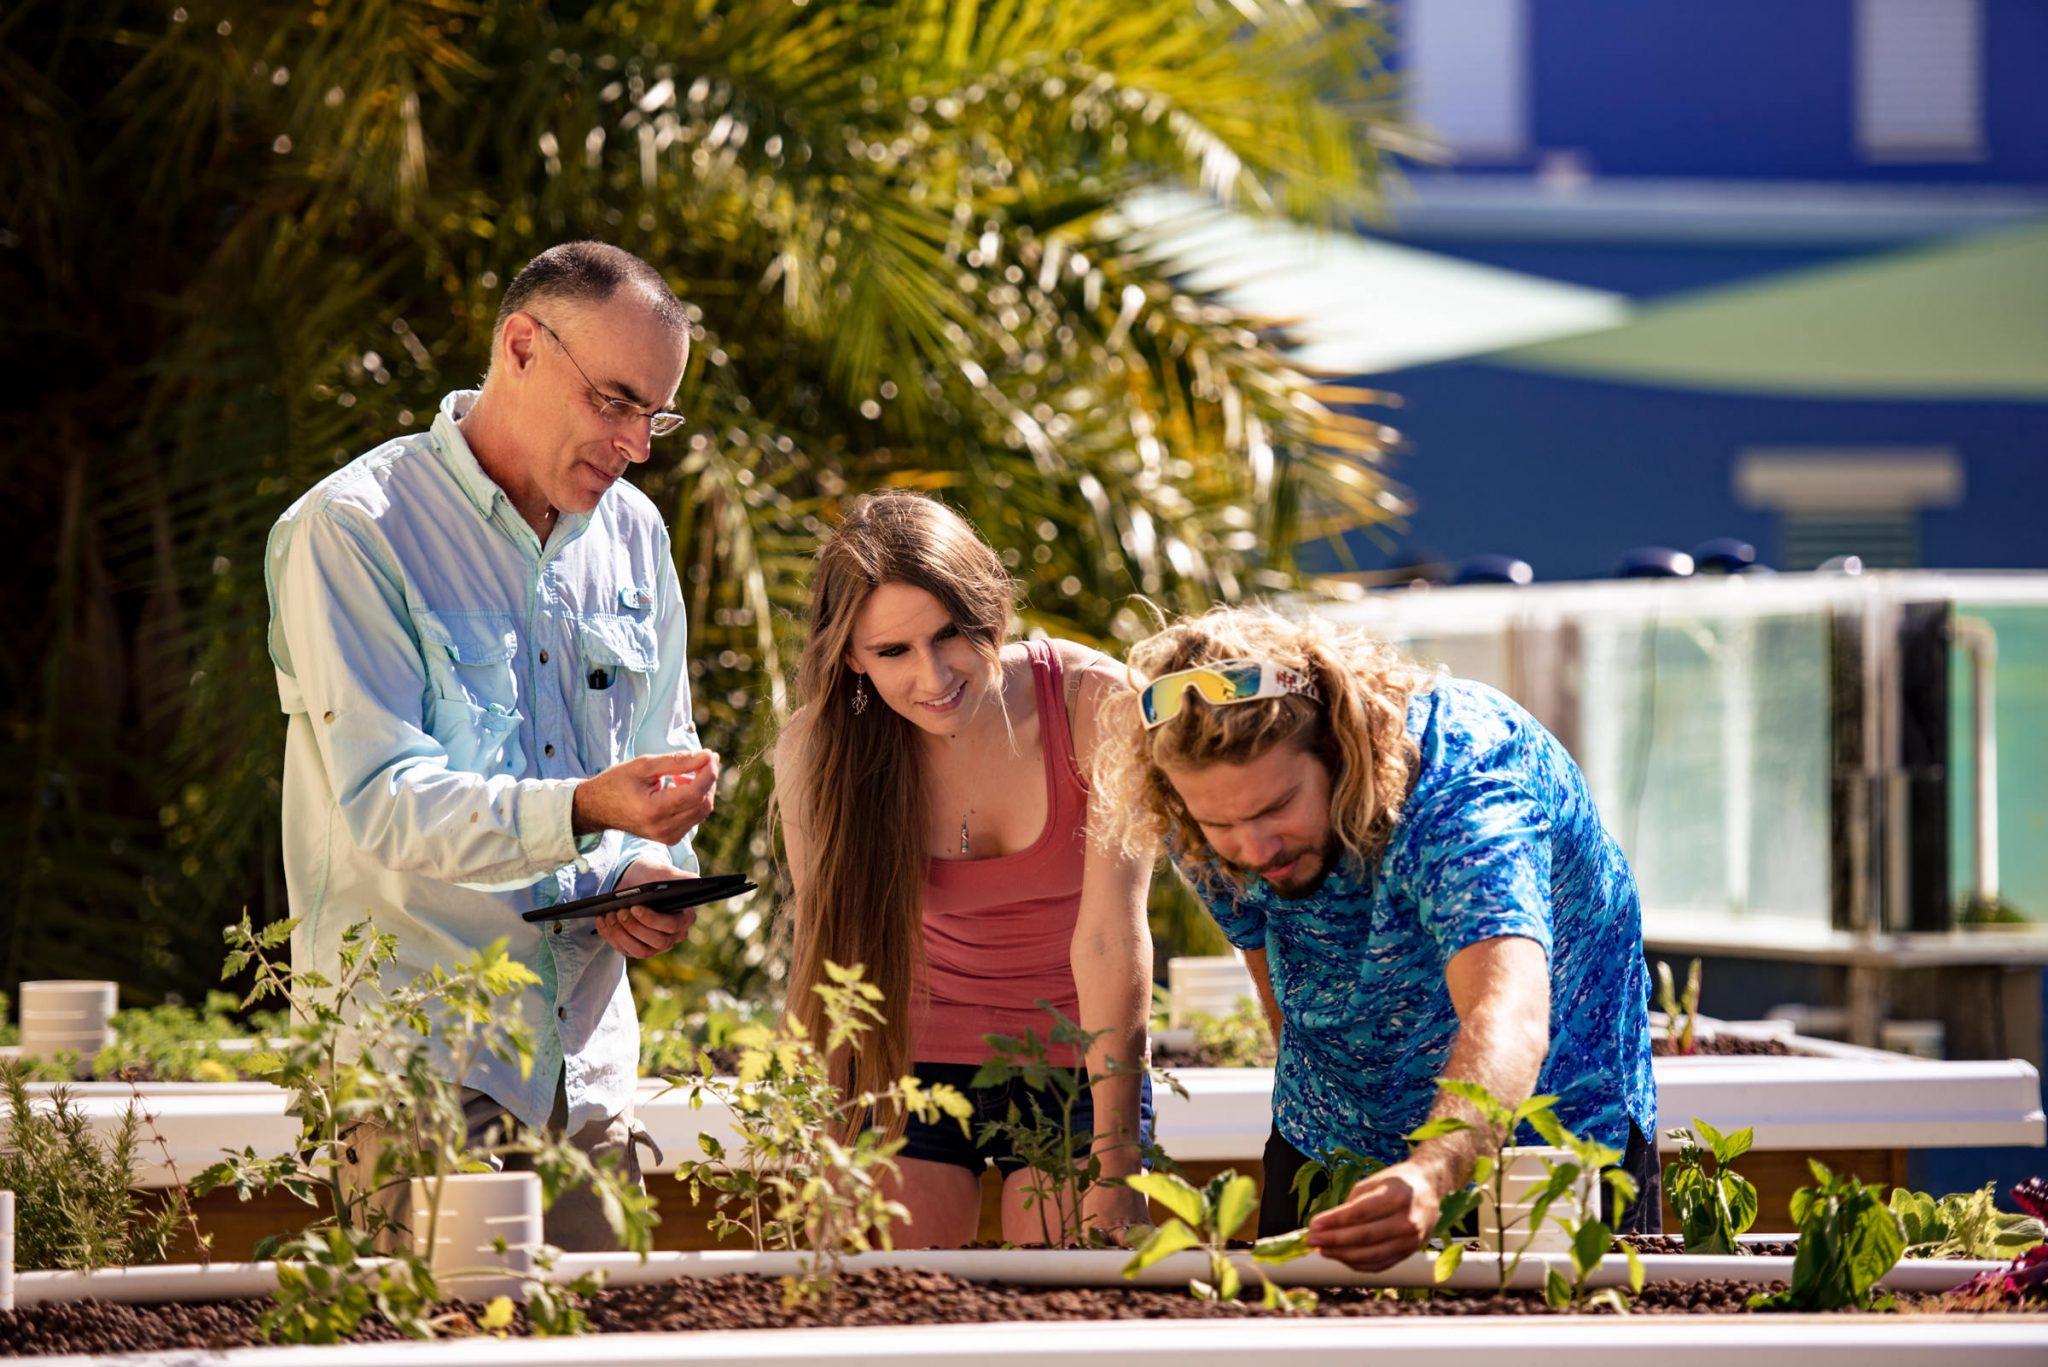 Professor showing students plant life